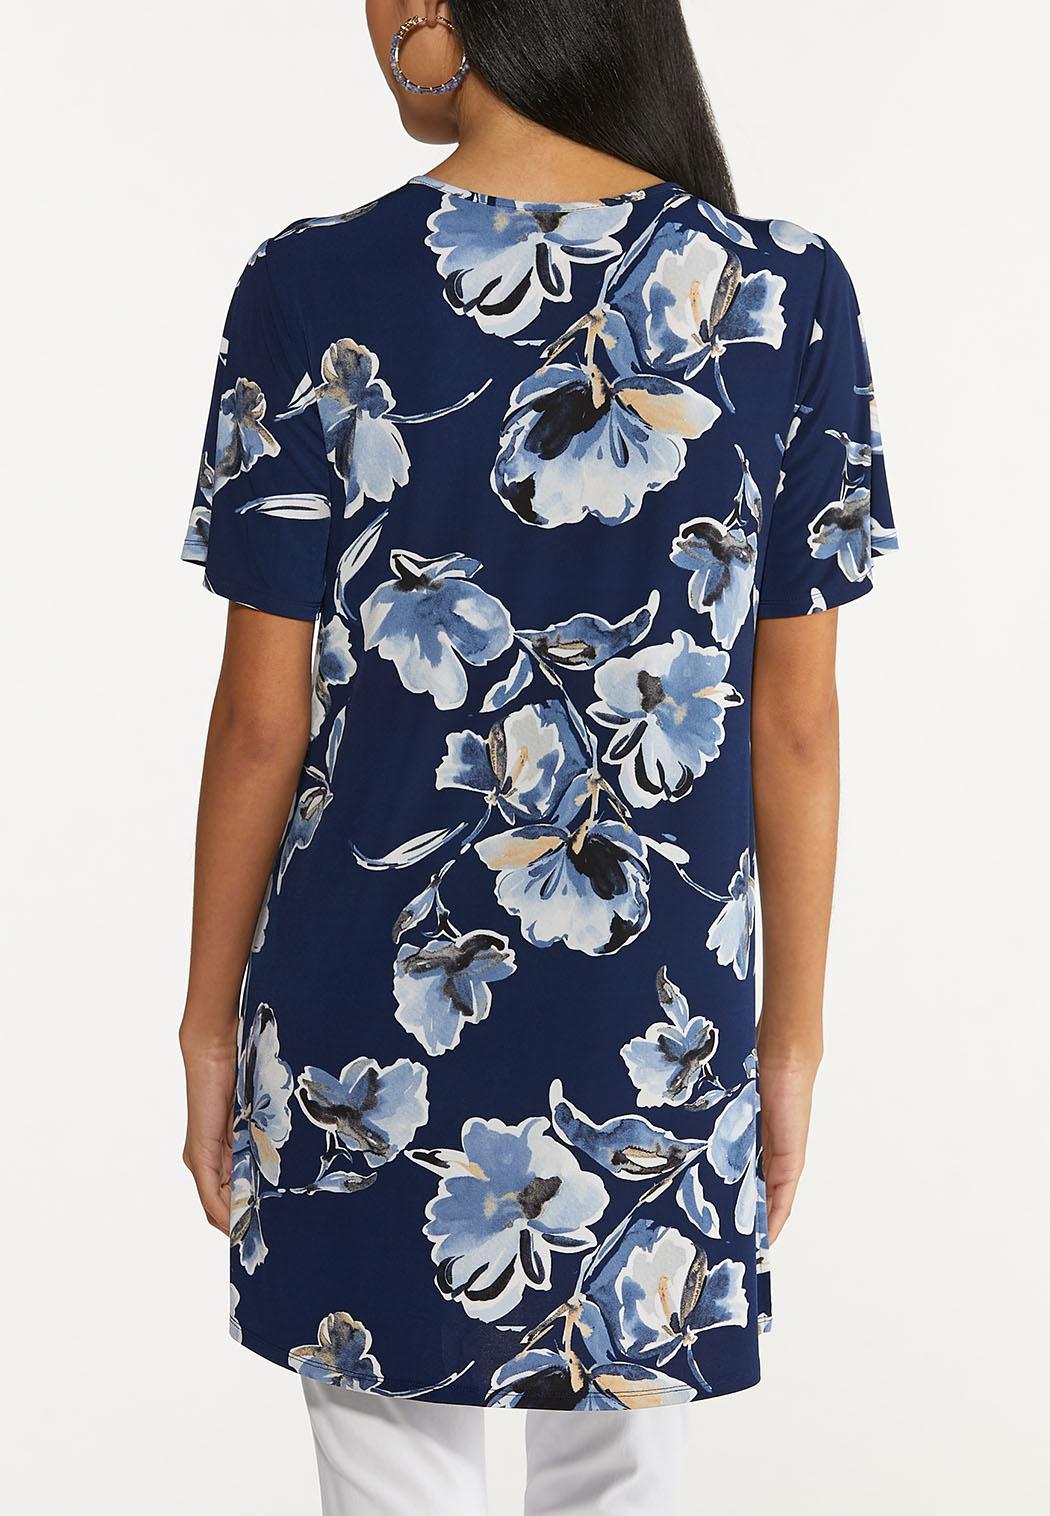 Floral Lattice Neck Top (Item #44646474)